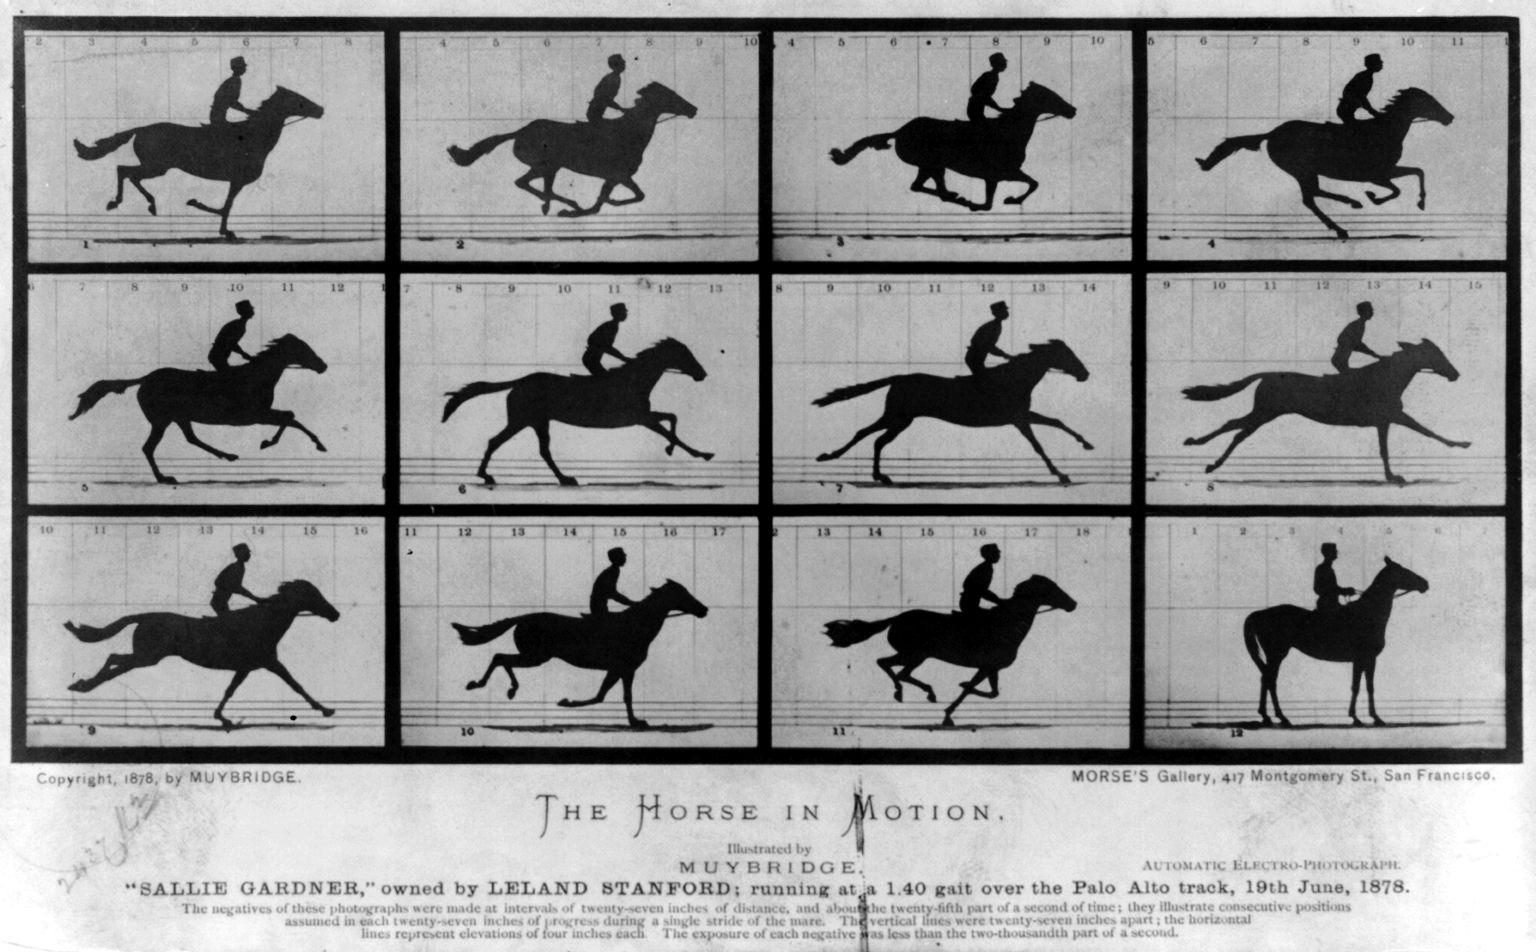 Muybridge Bullet Time Galloping Horse